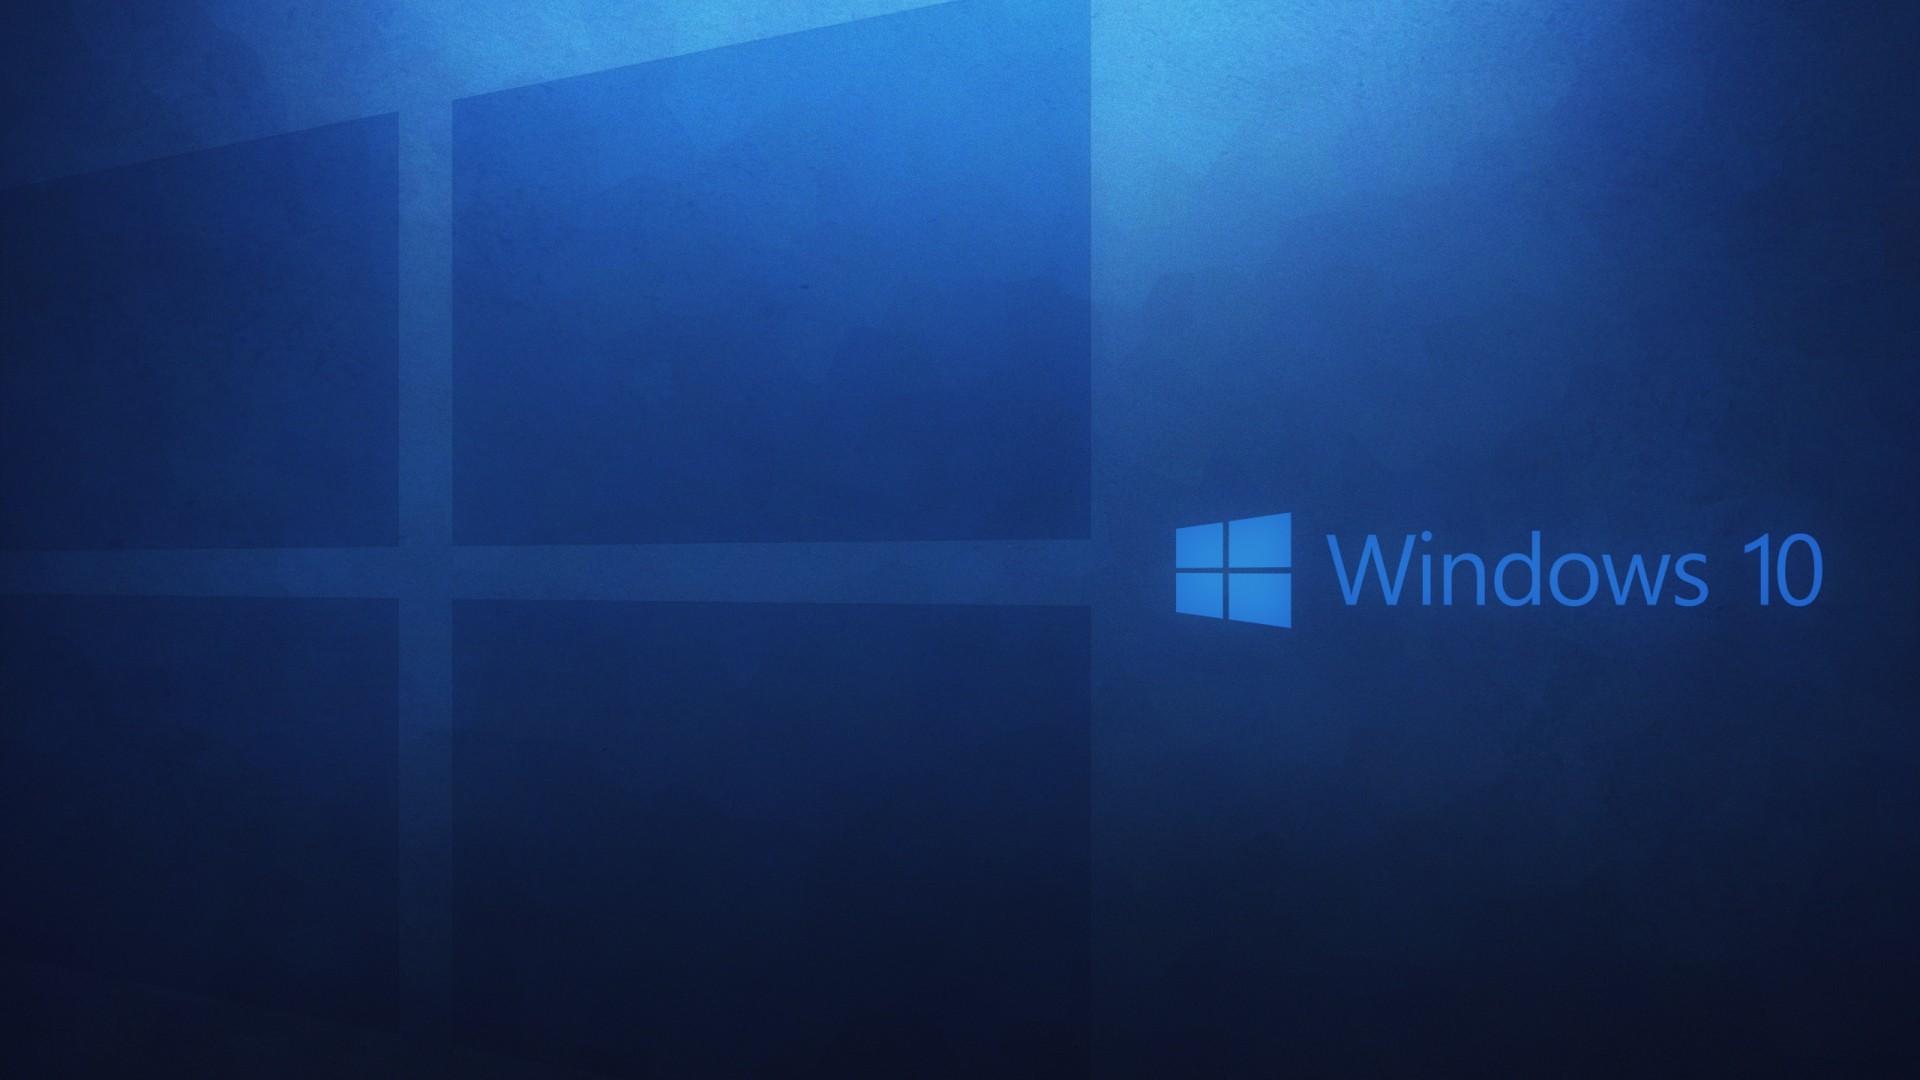 Windows Hd Wallpaper 1920x1080 67 Images